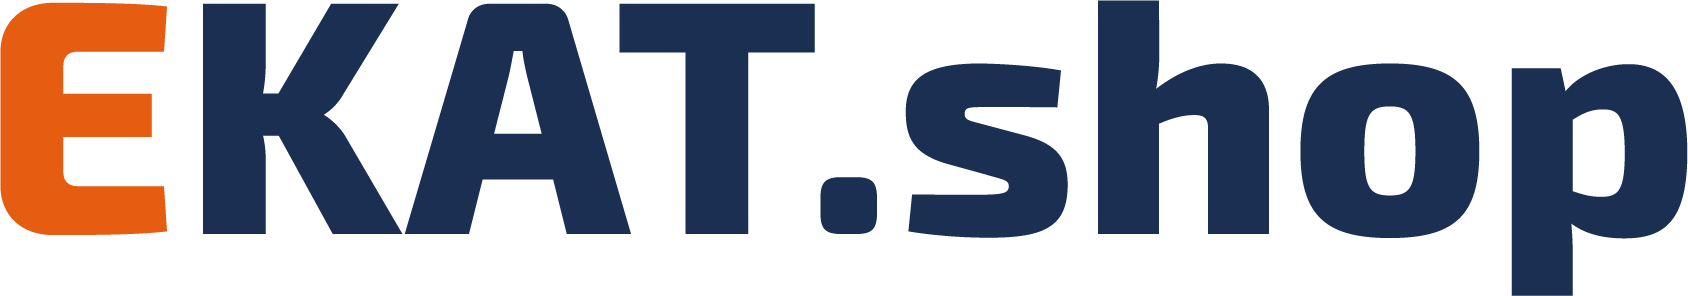 ekat.shop-Logo